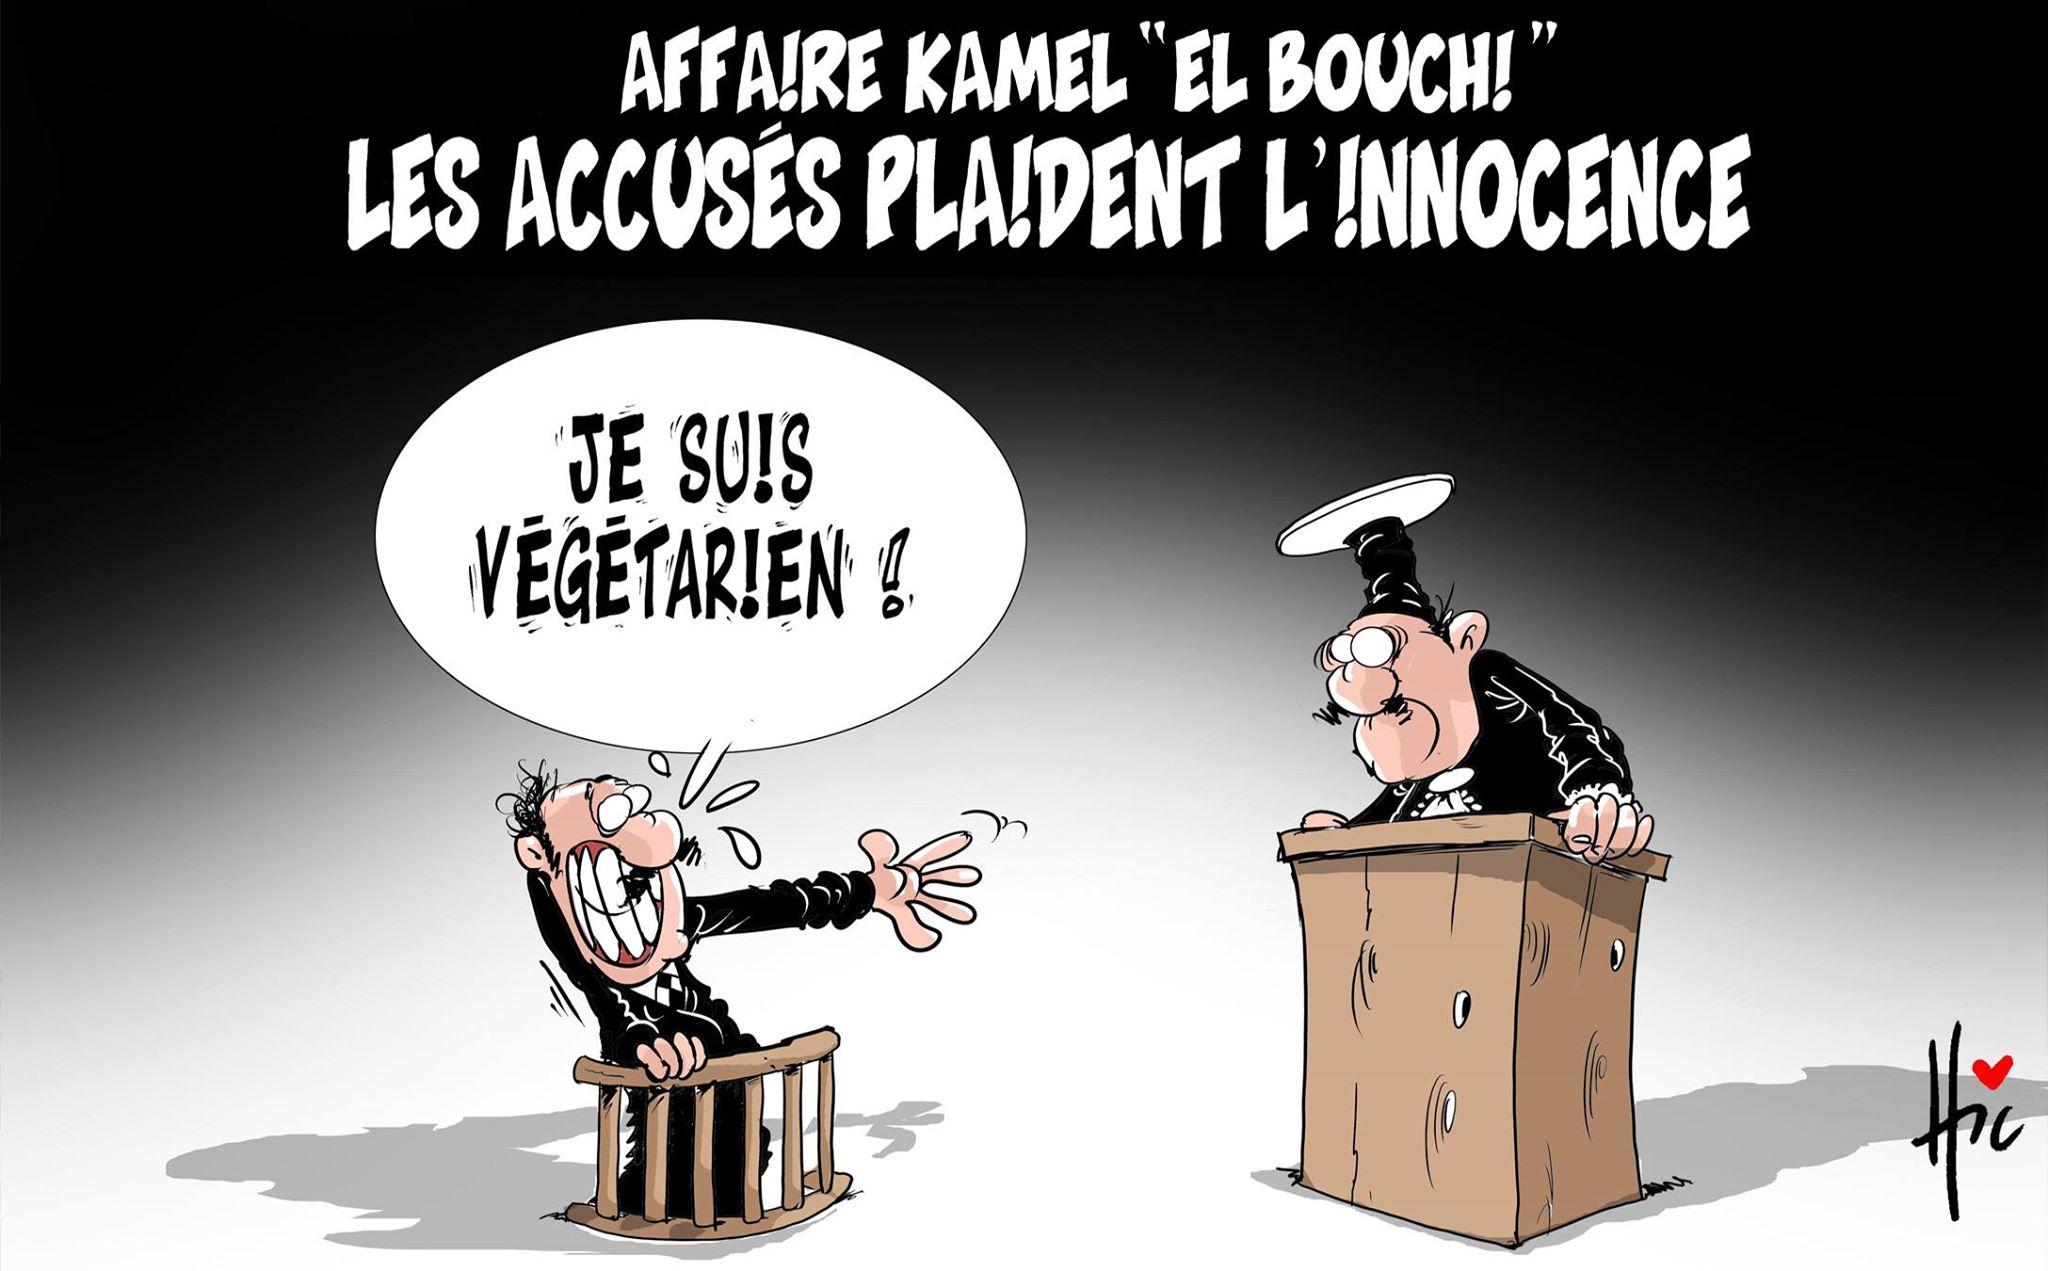 Affaire Kamel el bouchi : les accusés plaident l'innocence - Kamel el bouchi - Gagdz.com